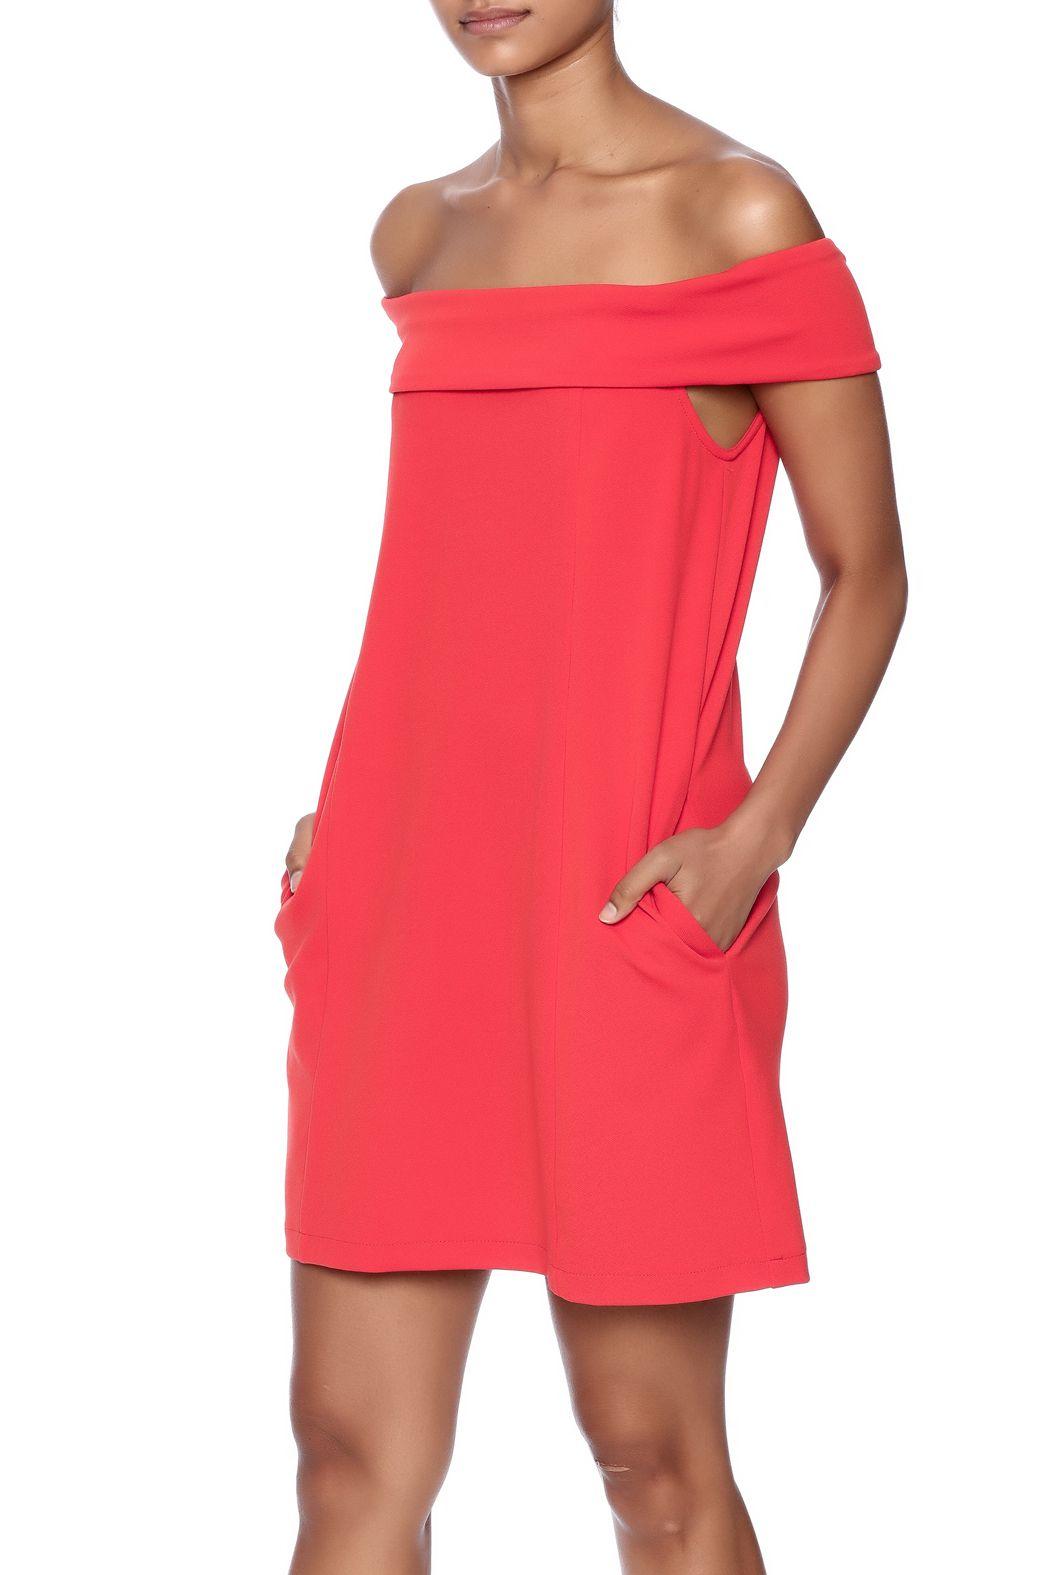 Alexuraw casual coral dress